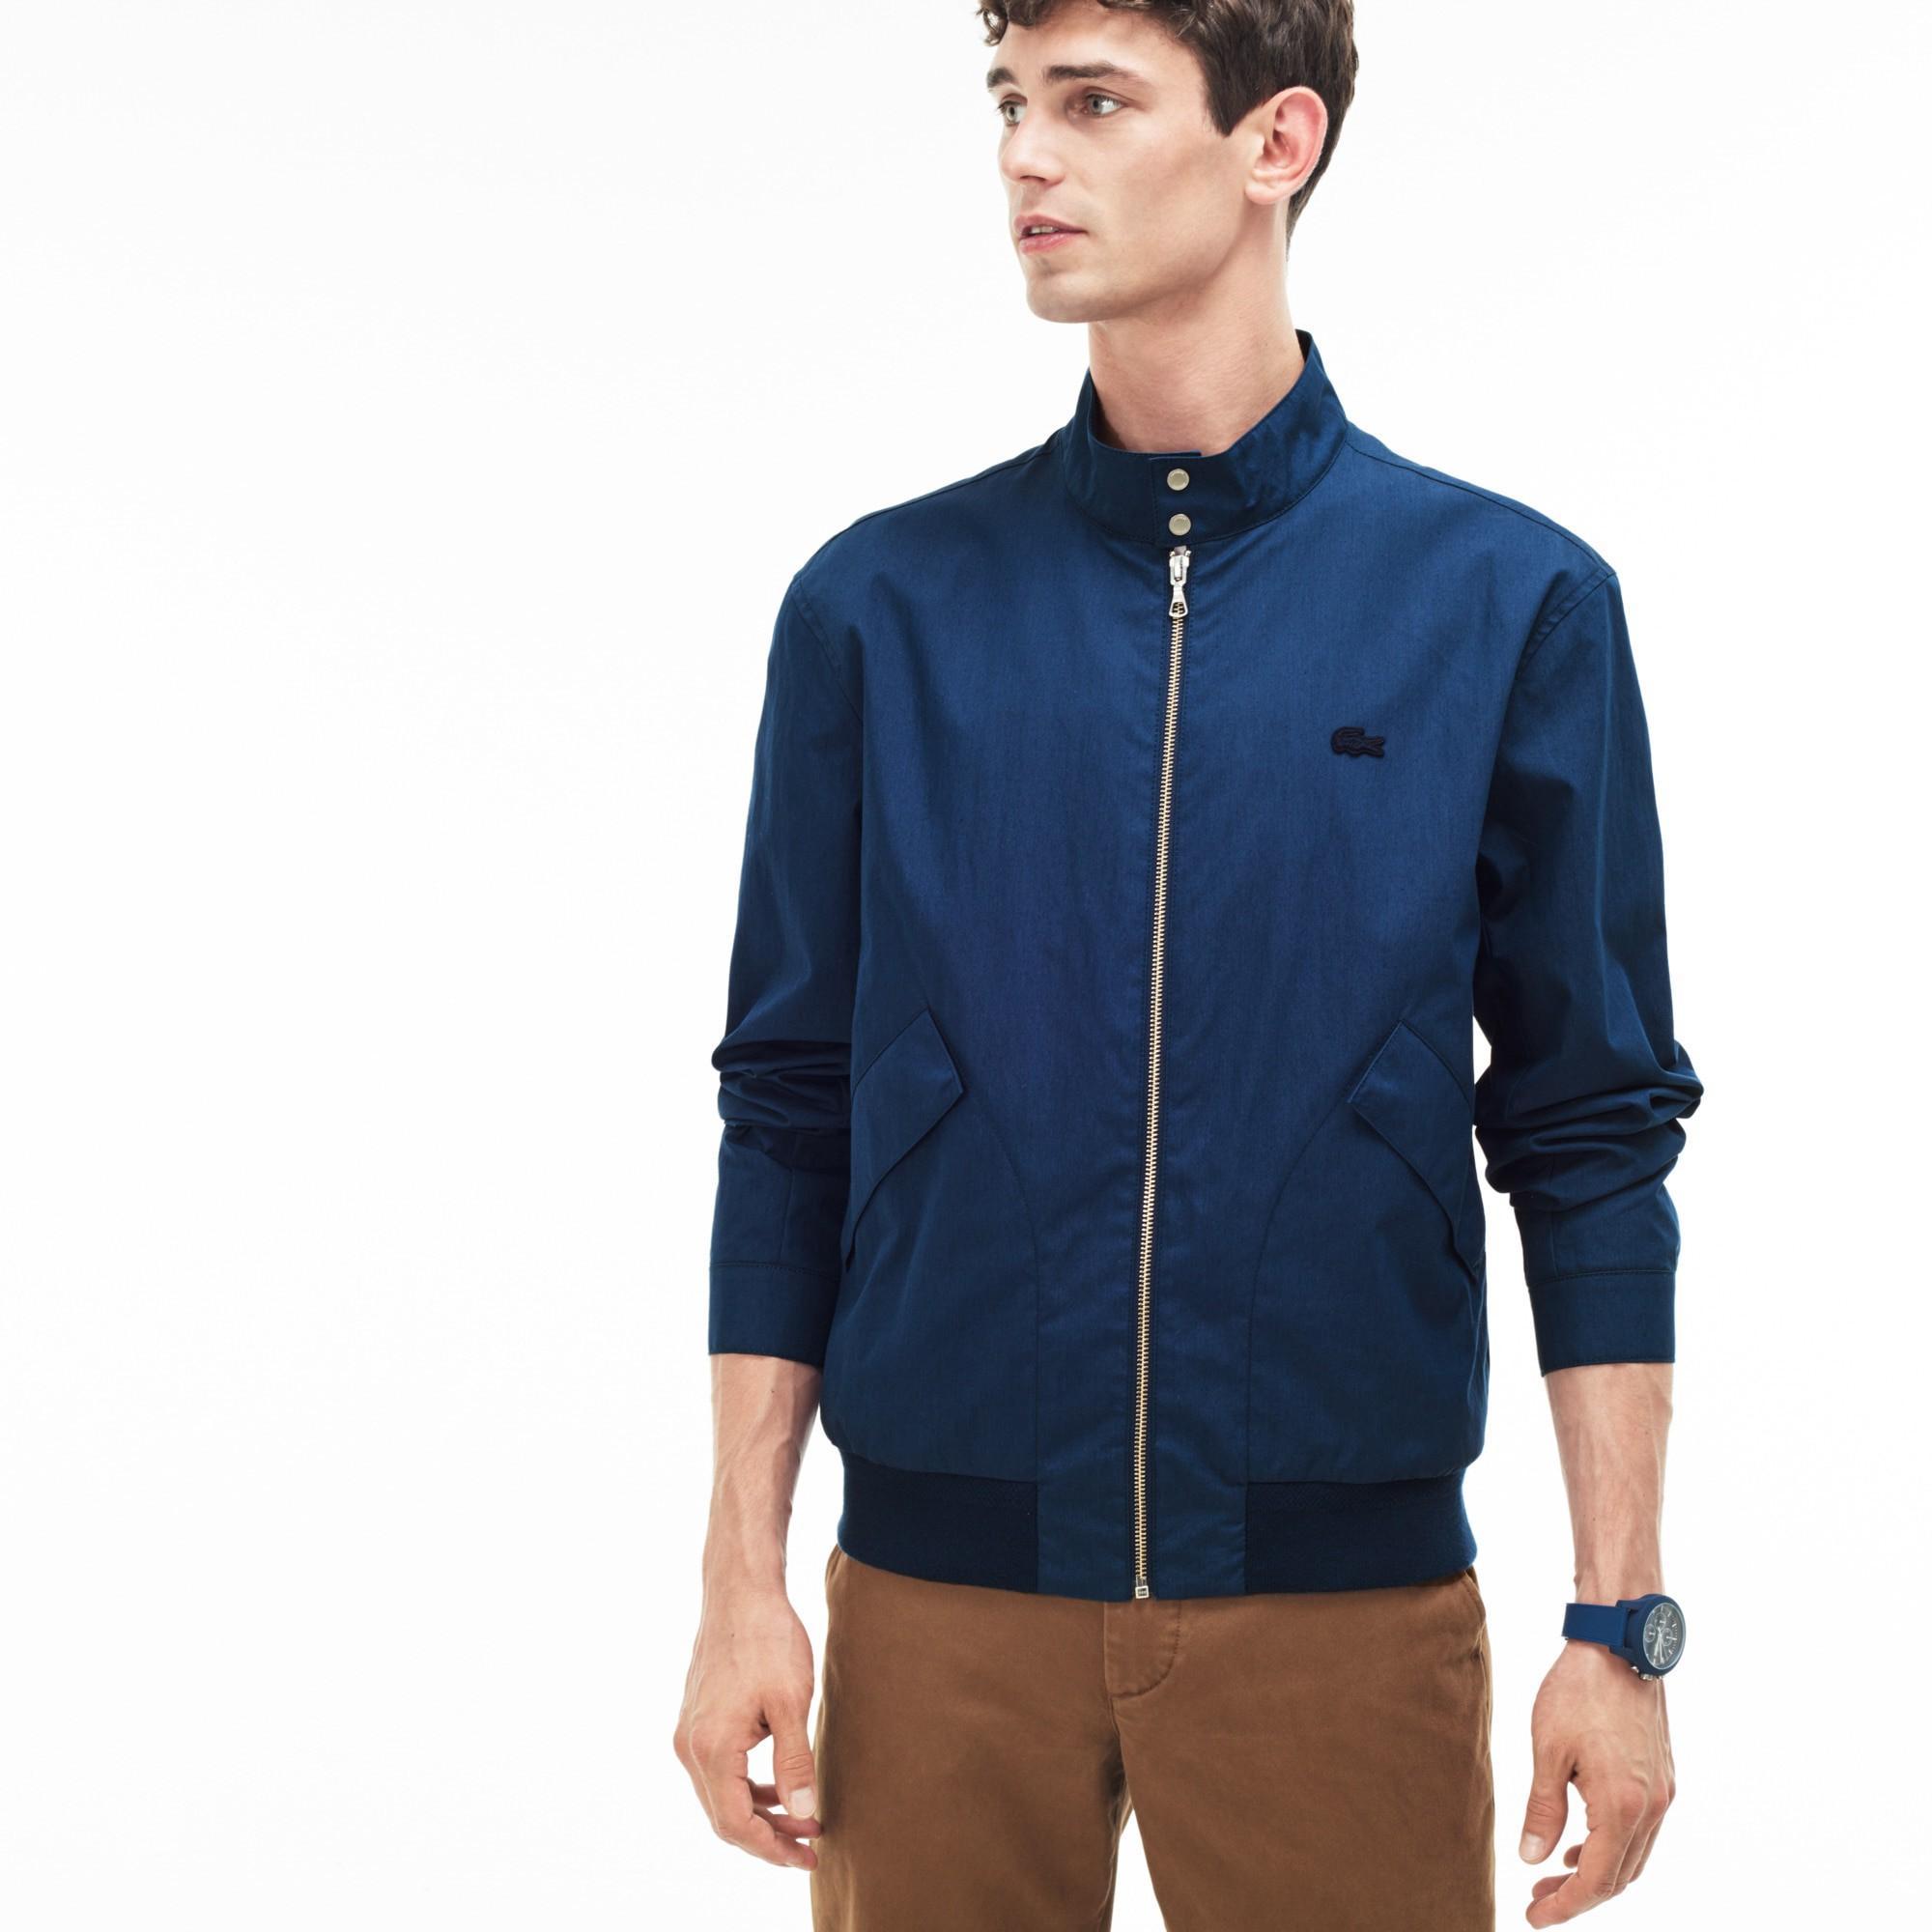 2e39f4025 Lacoste Men s Cotton Blend Gabardine Harrington Jacket In Navy Blue ...